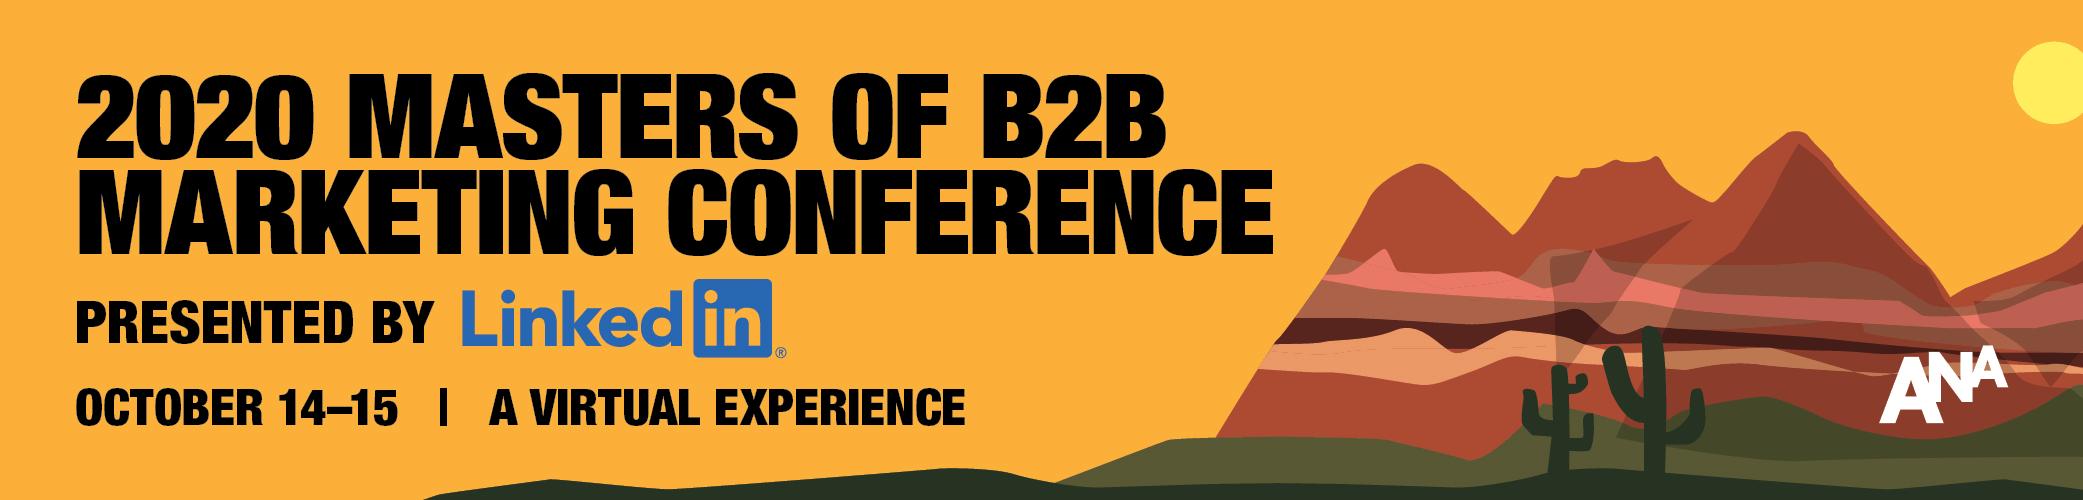 2020-B2B-conference-landing-2.png